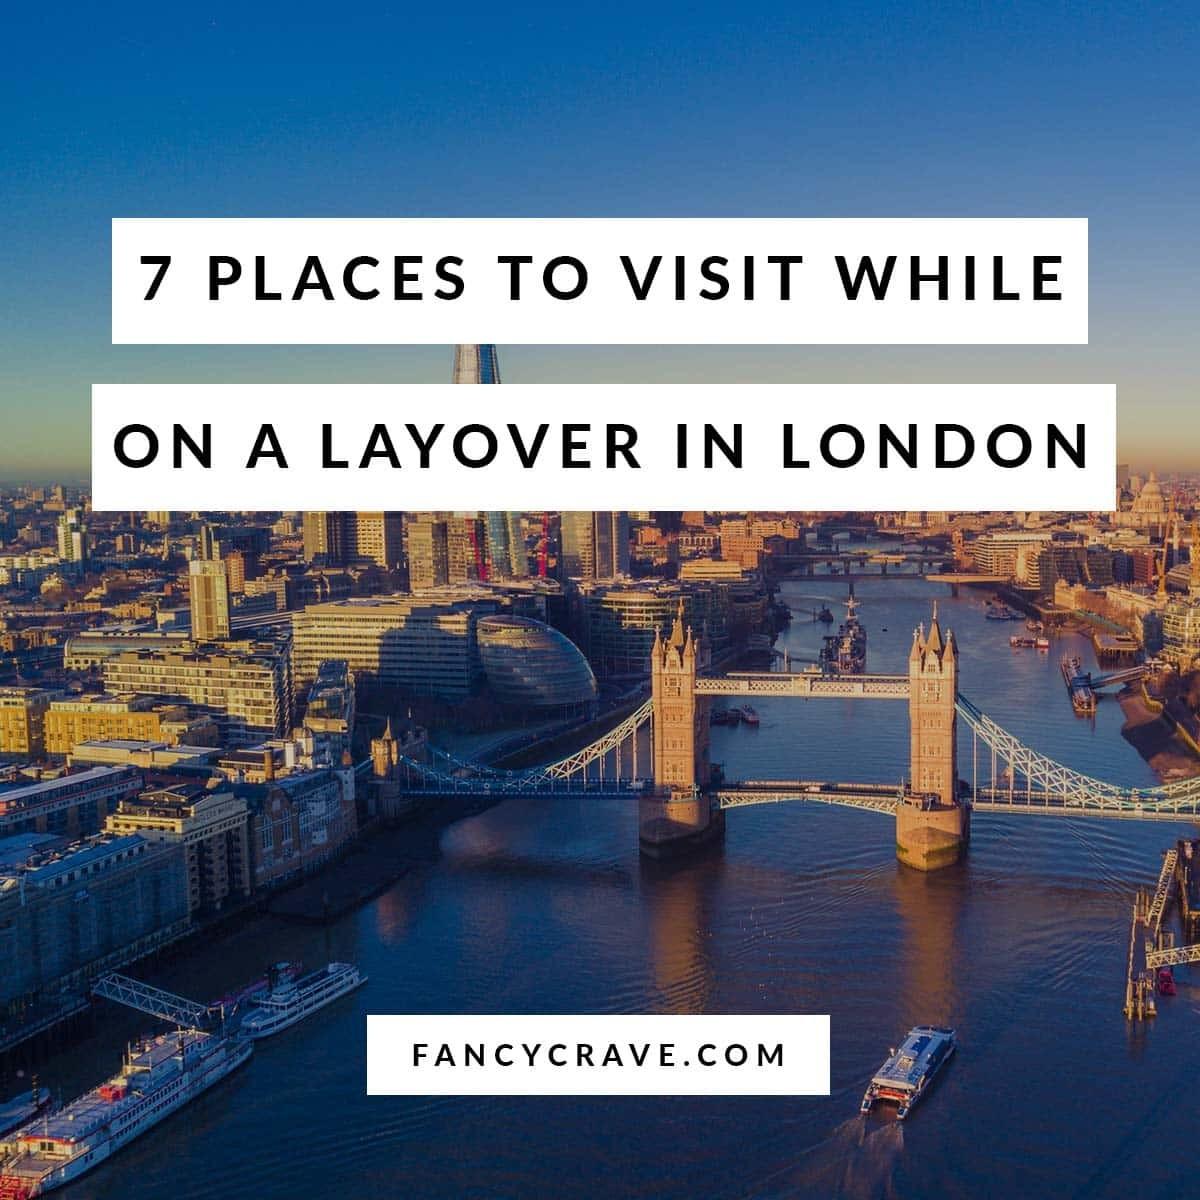 Layover in London